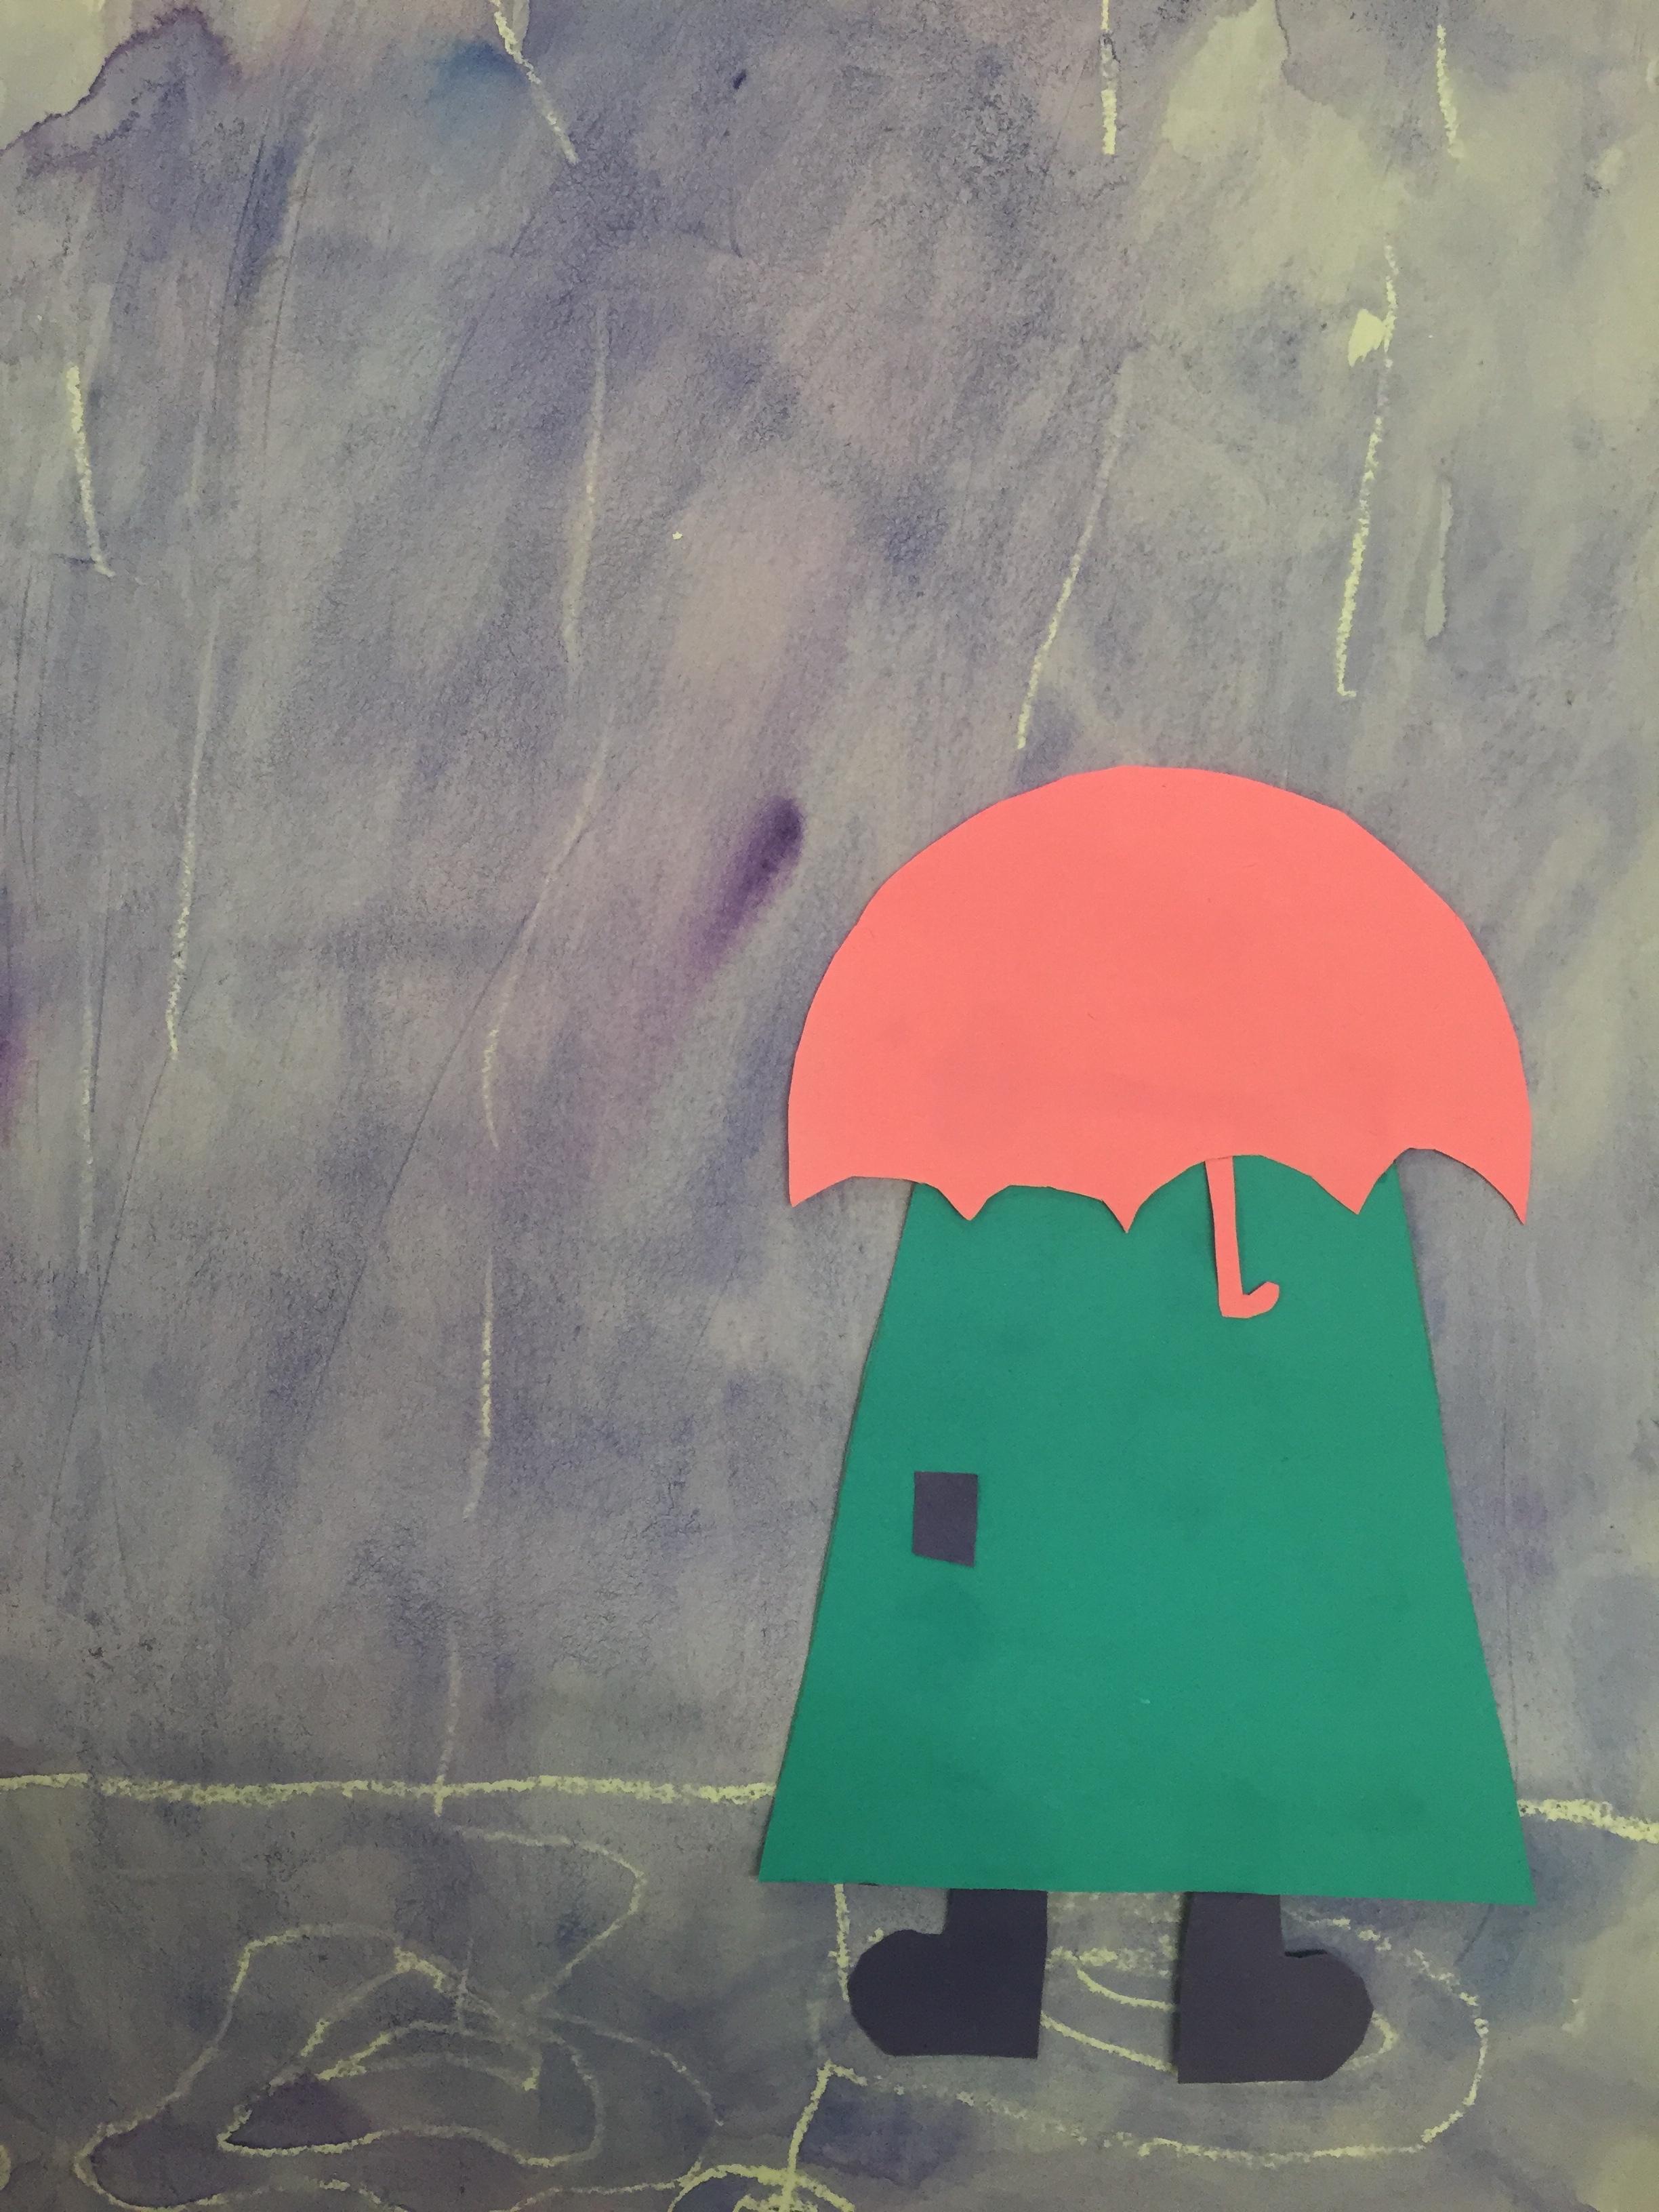 img_1010  Th Grade Name Art on 4th grade books, 4th grade halloween, 4th grade games, 4th grade portraits, 4th grade clay projects, 4th grade scrapbook, 4th grade origami, 4th grade father's day, 4th grade puzzles, 1st grade name art, 4th grade graduation, 4th grade ocean,